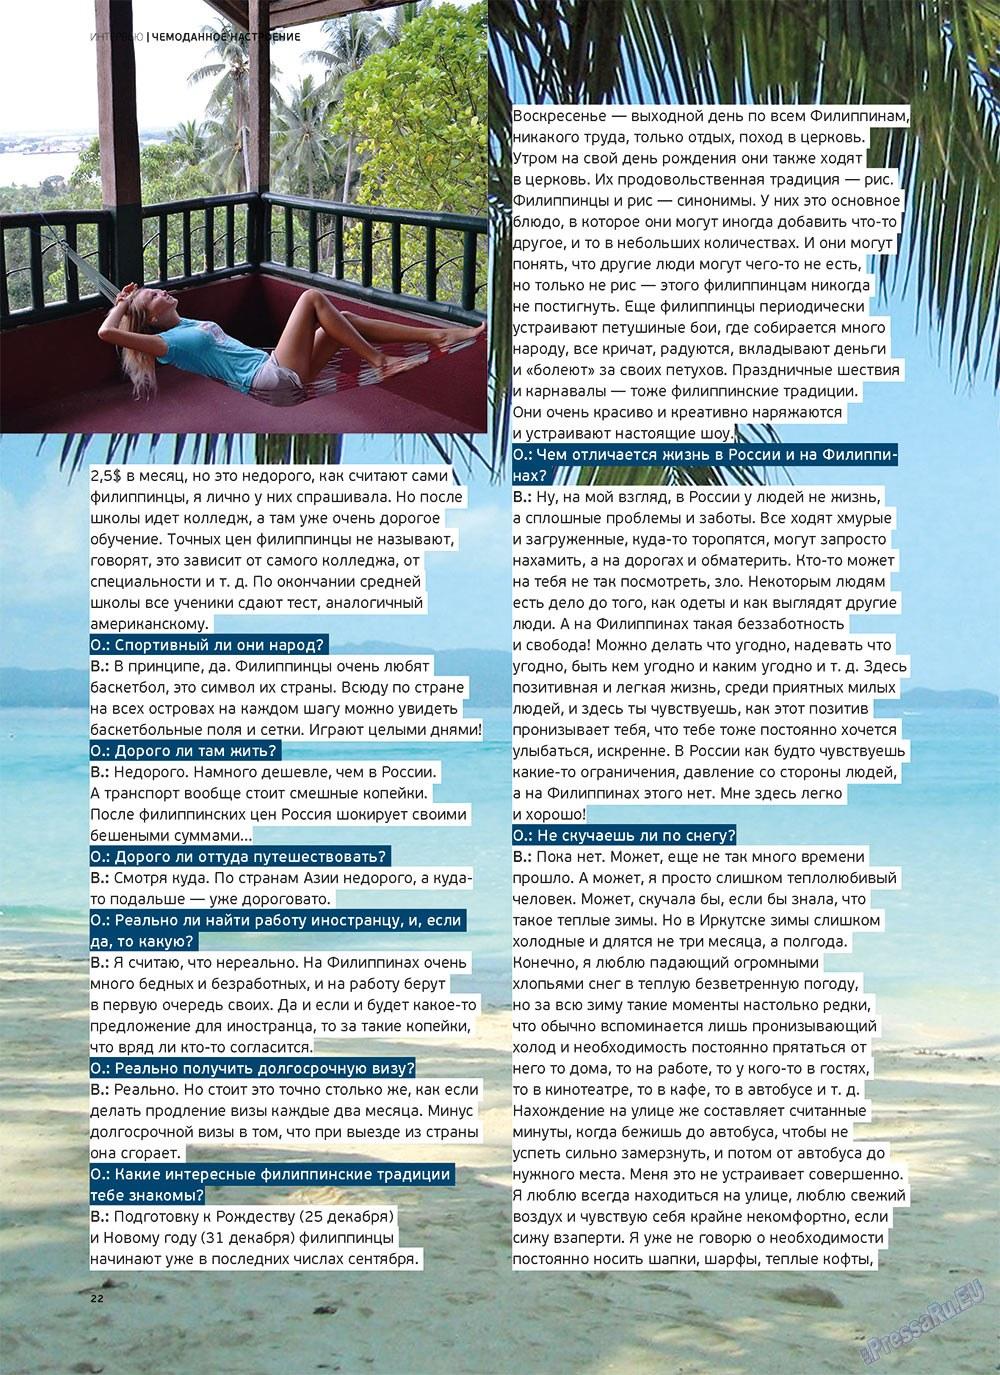 Артек (журнал). 2012 год, номер 5, стр. 24